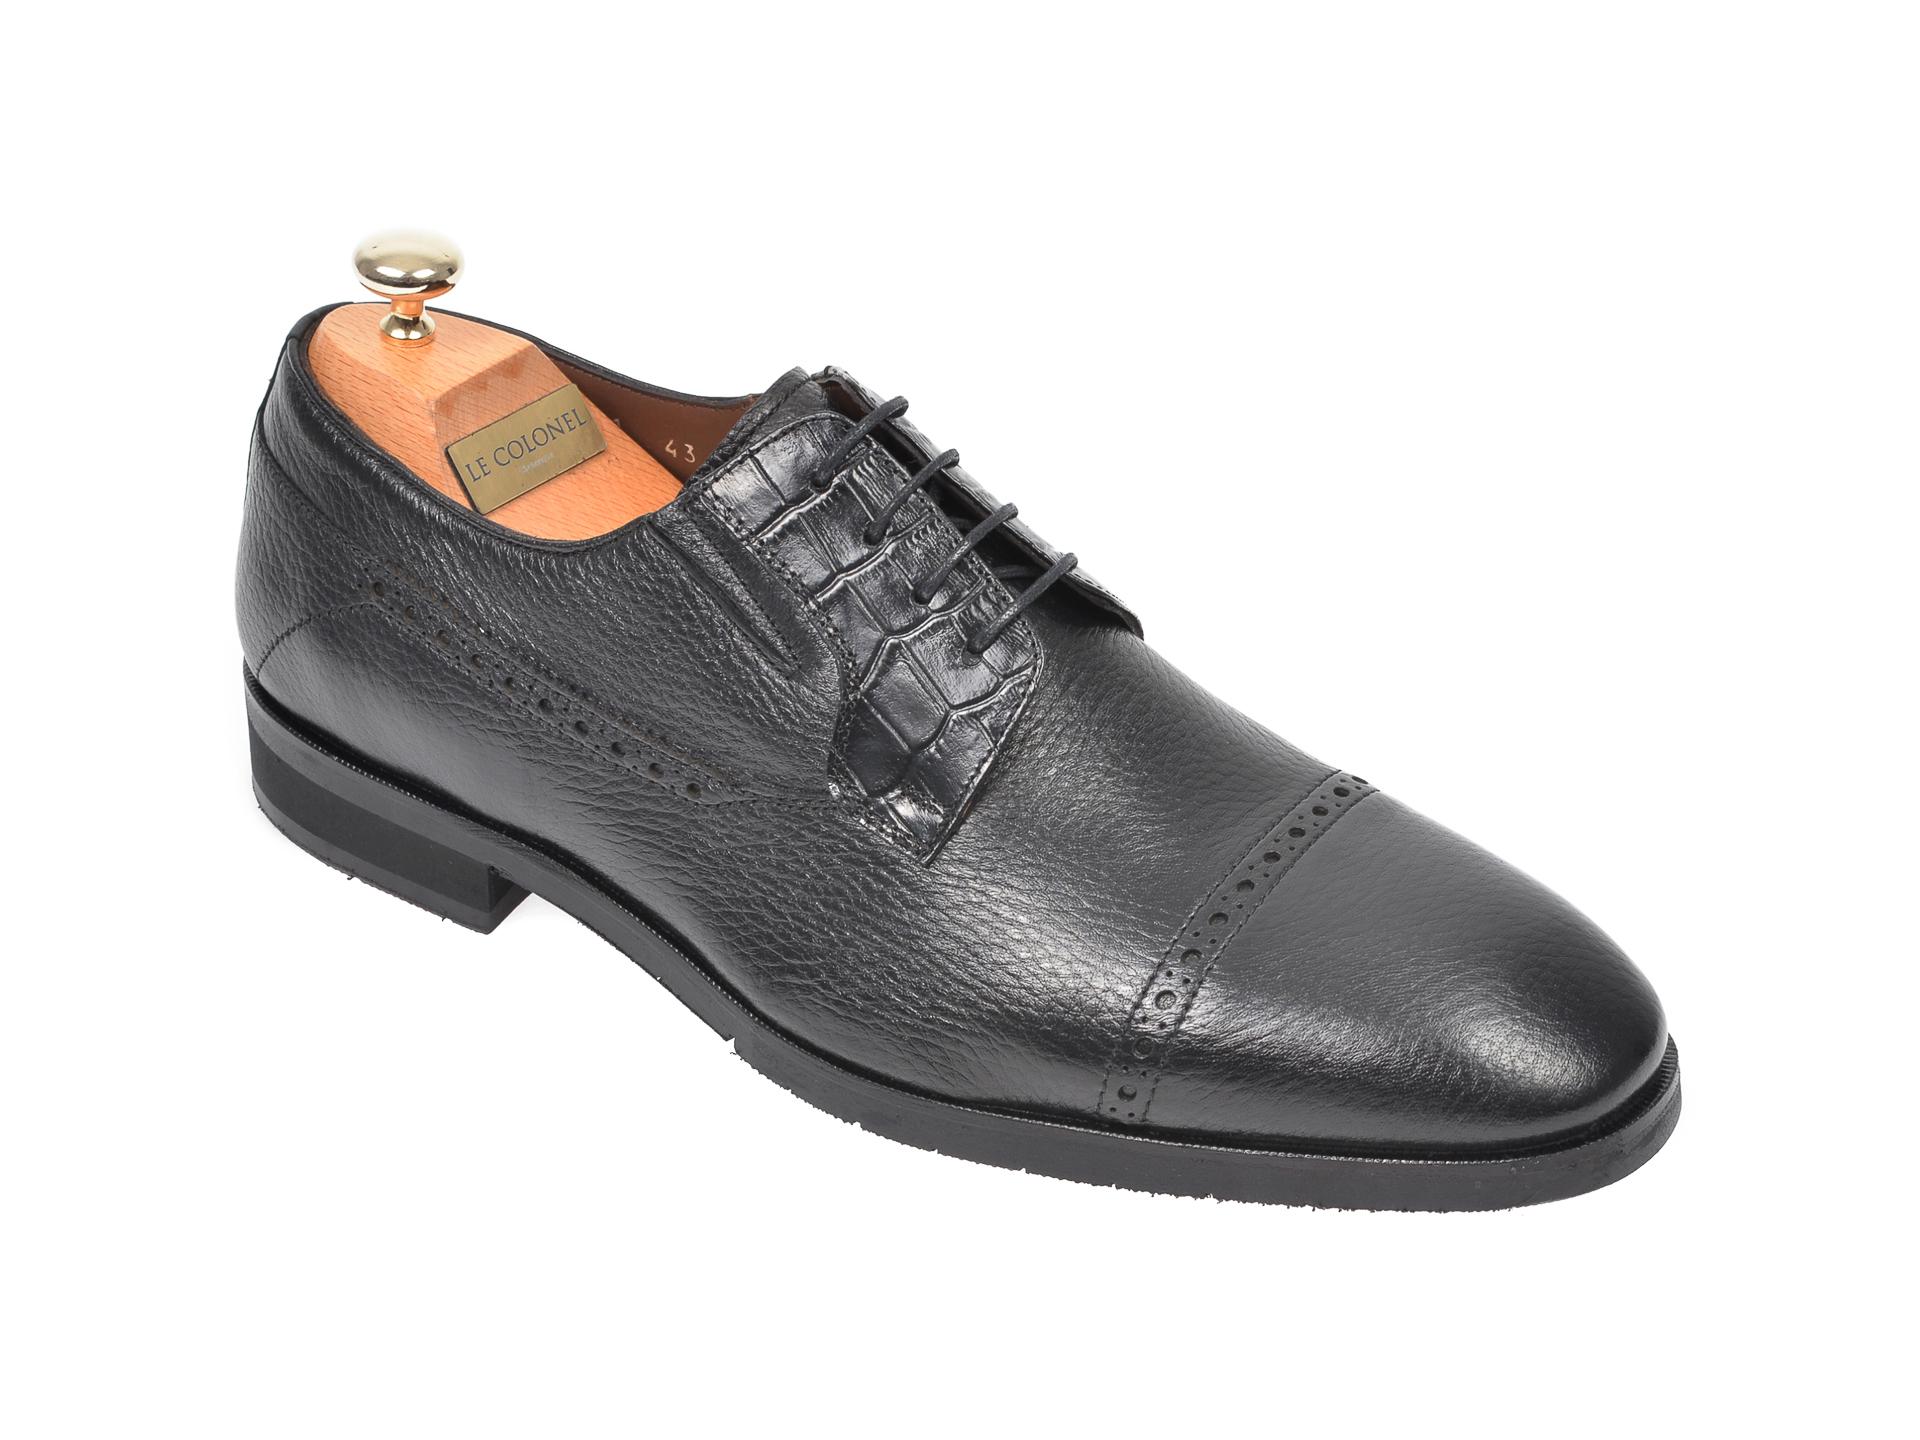 Pantofi LE COLONEL negri, 48731, din piele naturala imagine